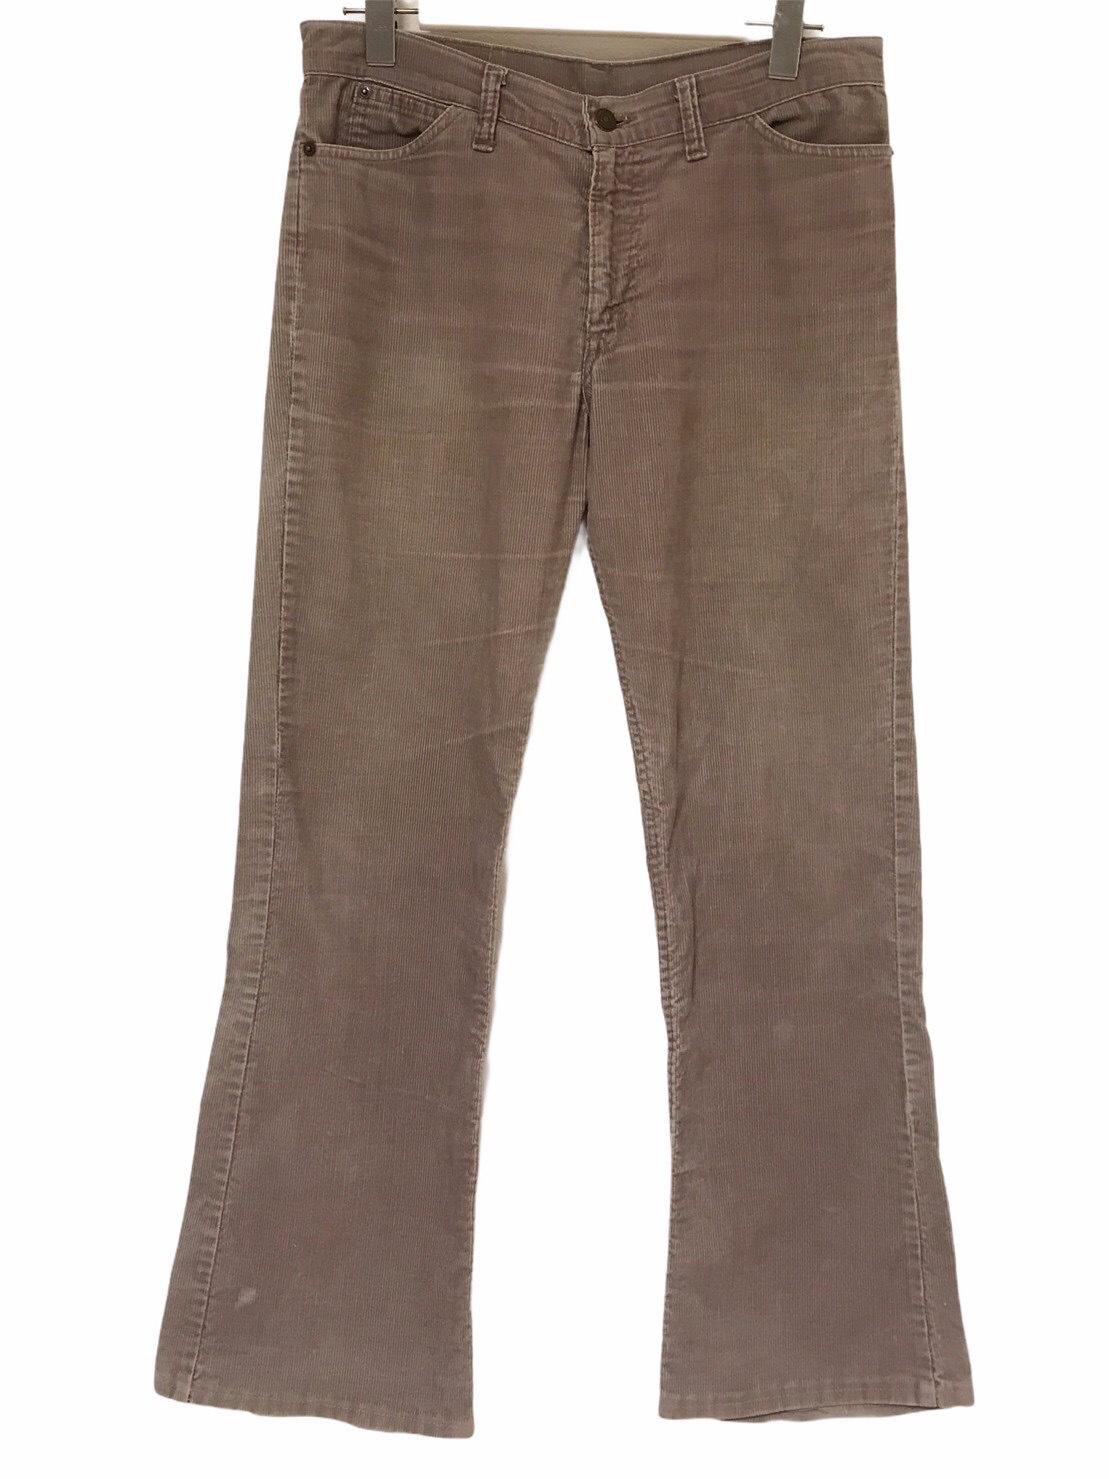 80's Levis 517 Corduroy pants Gray 42talon made in USA W31